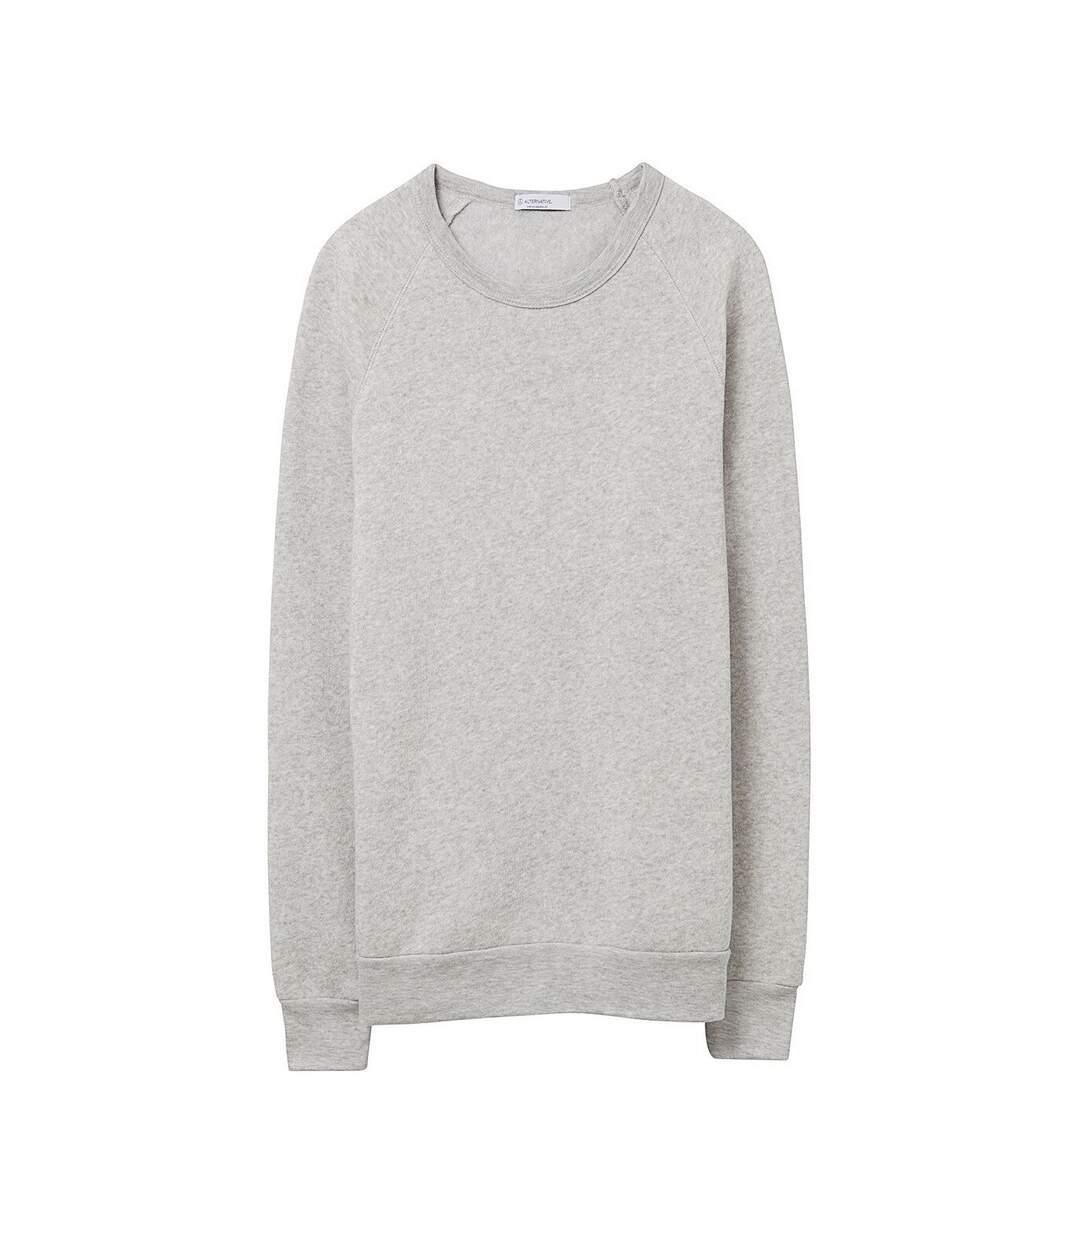 Alternative Apparel - Pullover CHAMP - Homme (Gris) - UTRW6013